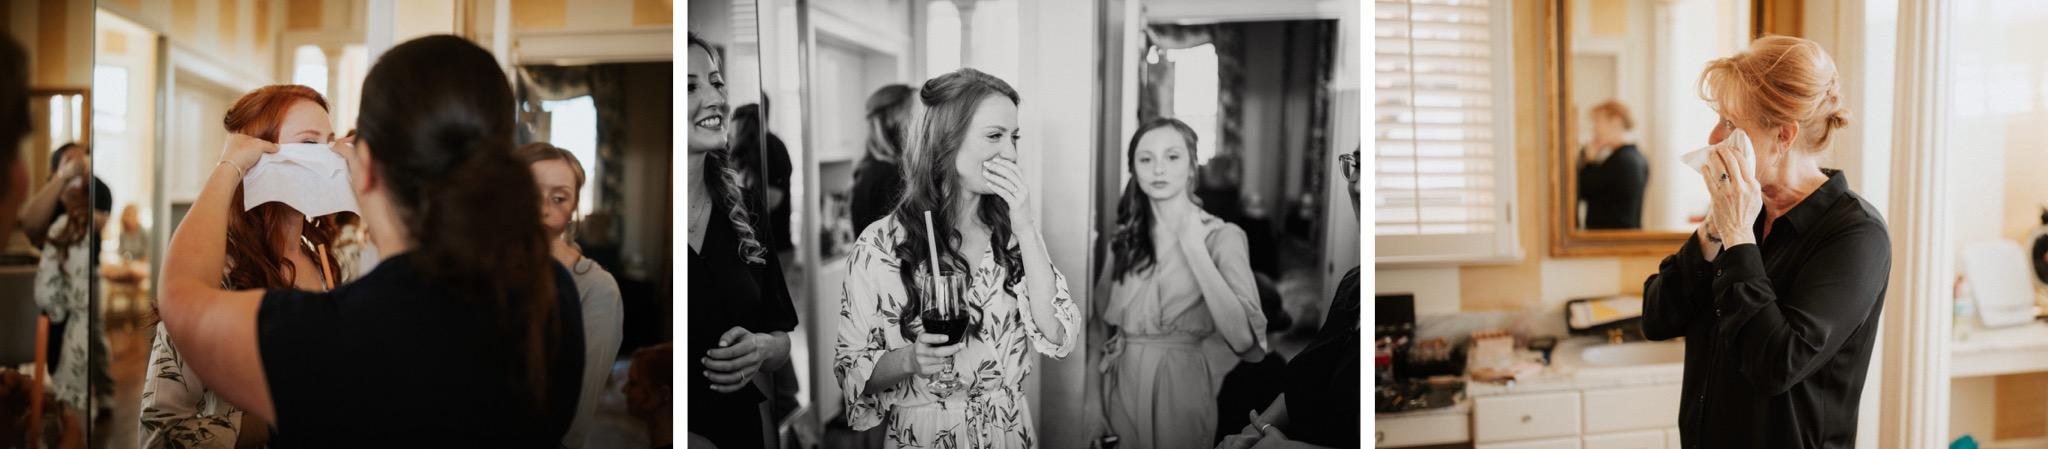 12_West Manor Estate Weddings - Pat Cori Photography-24_West Manor Estate Weddings - Pat Cori Photography-25_West Manor Estate Weddings - Pat Cori Photography-27_bride_VirginiaWeddingPhotographer_gettingready_WestManorEstate_Portraits_Wedding.jpg